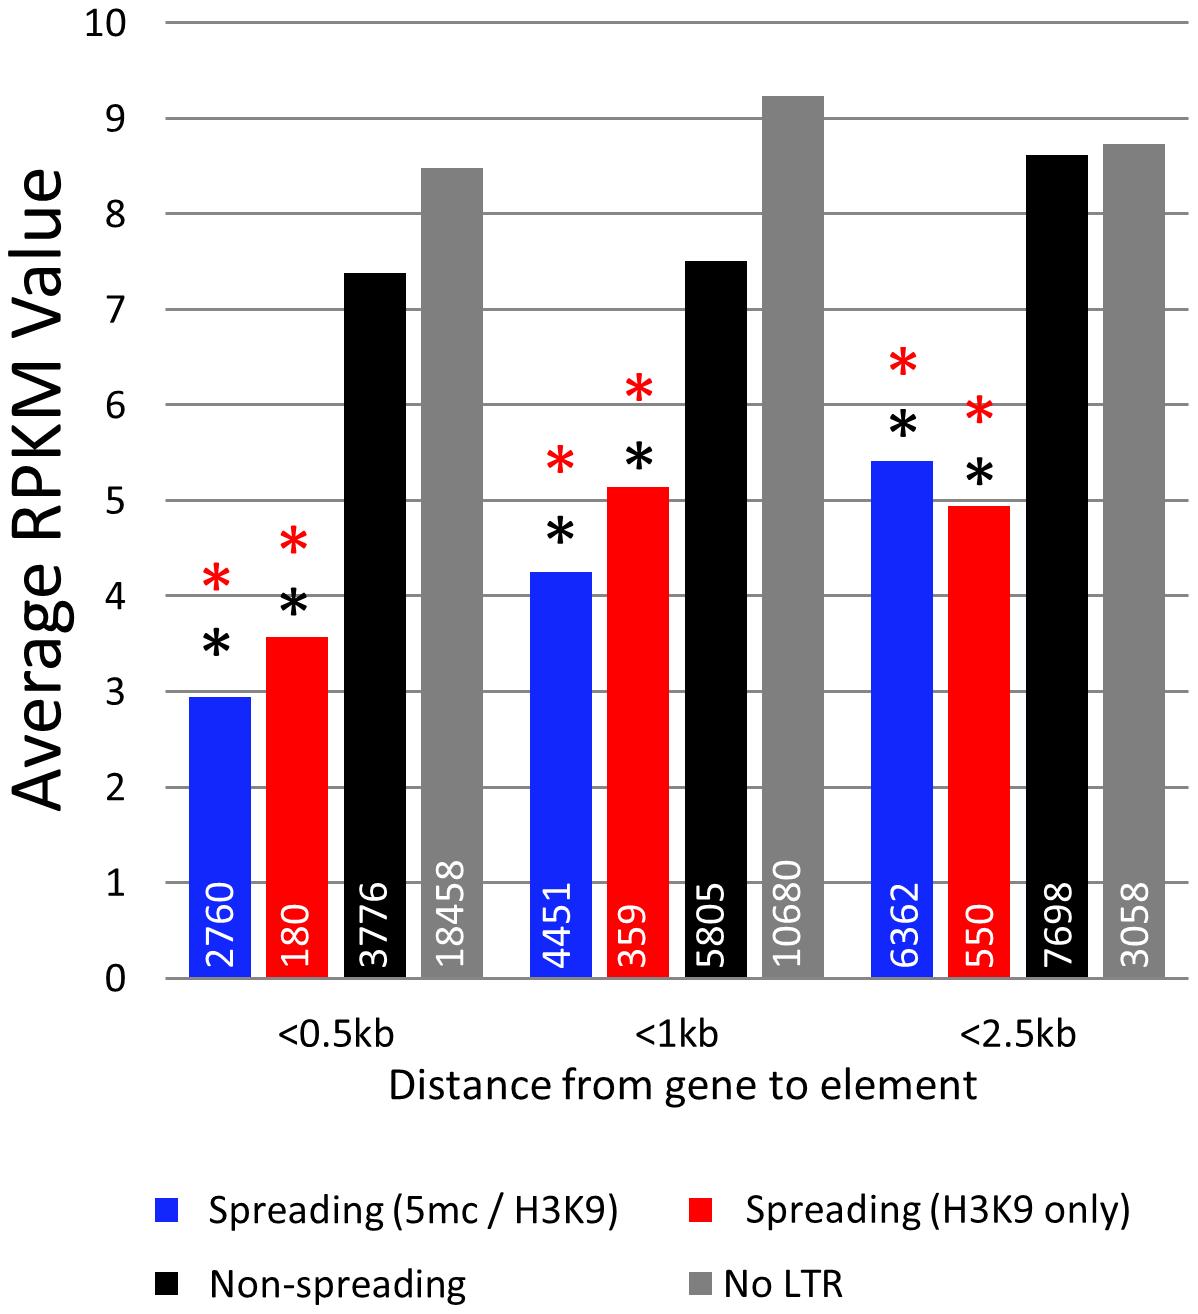 Genes near spreading retrotransposons show lower expression than genes near non-spreading retrotransposons.